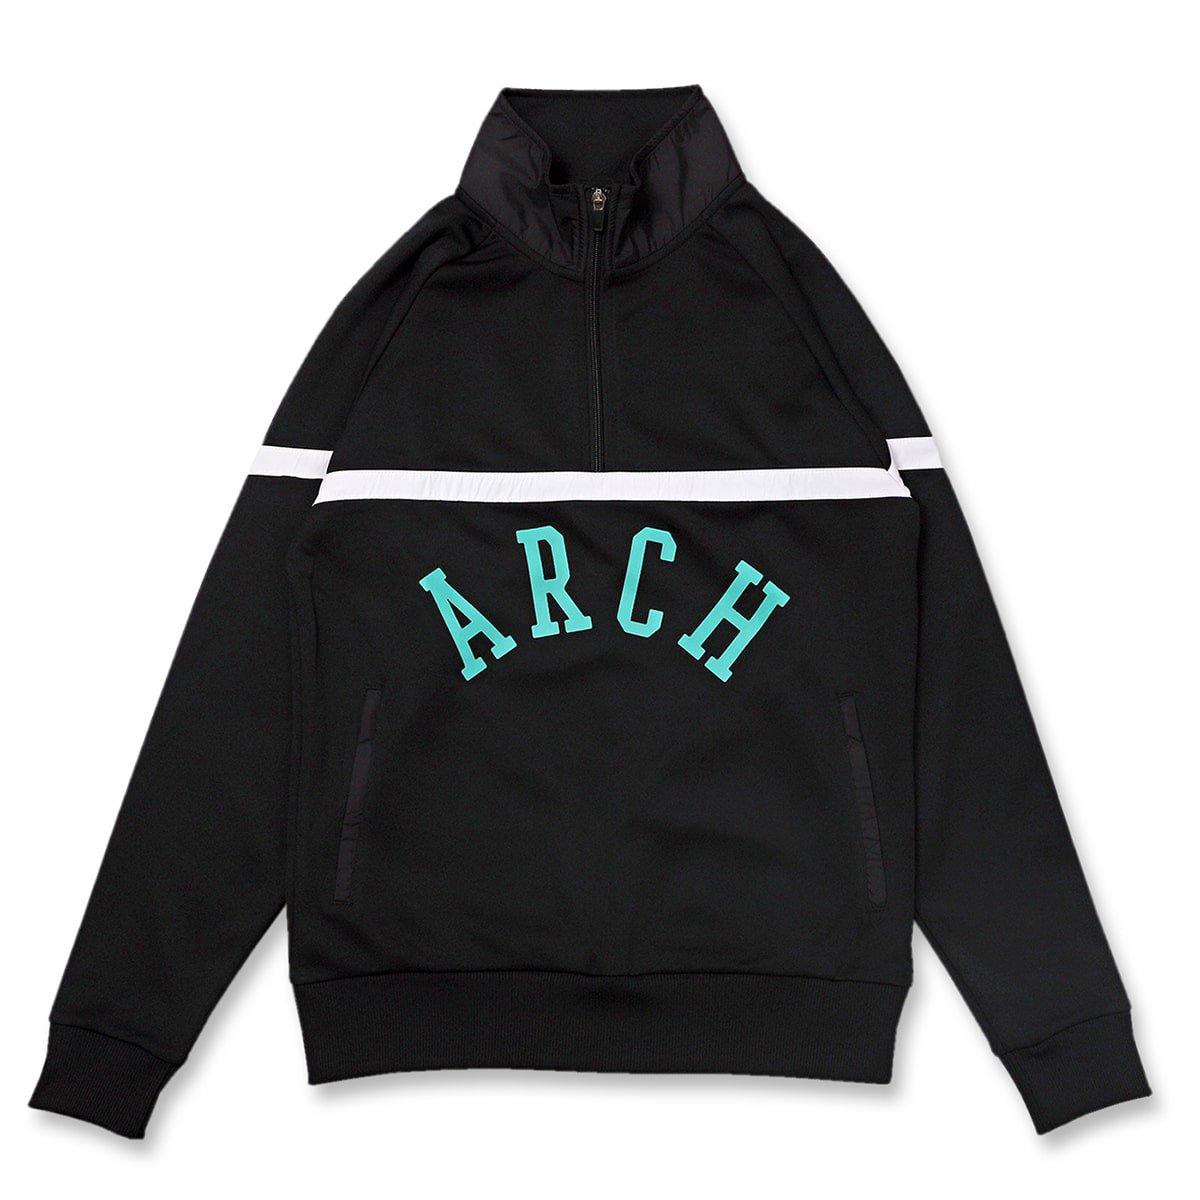 half zipped jersey【black】